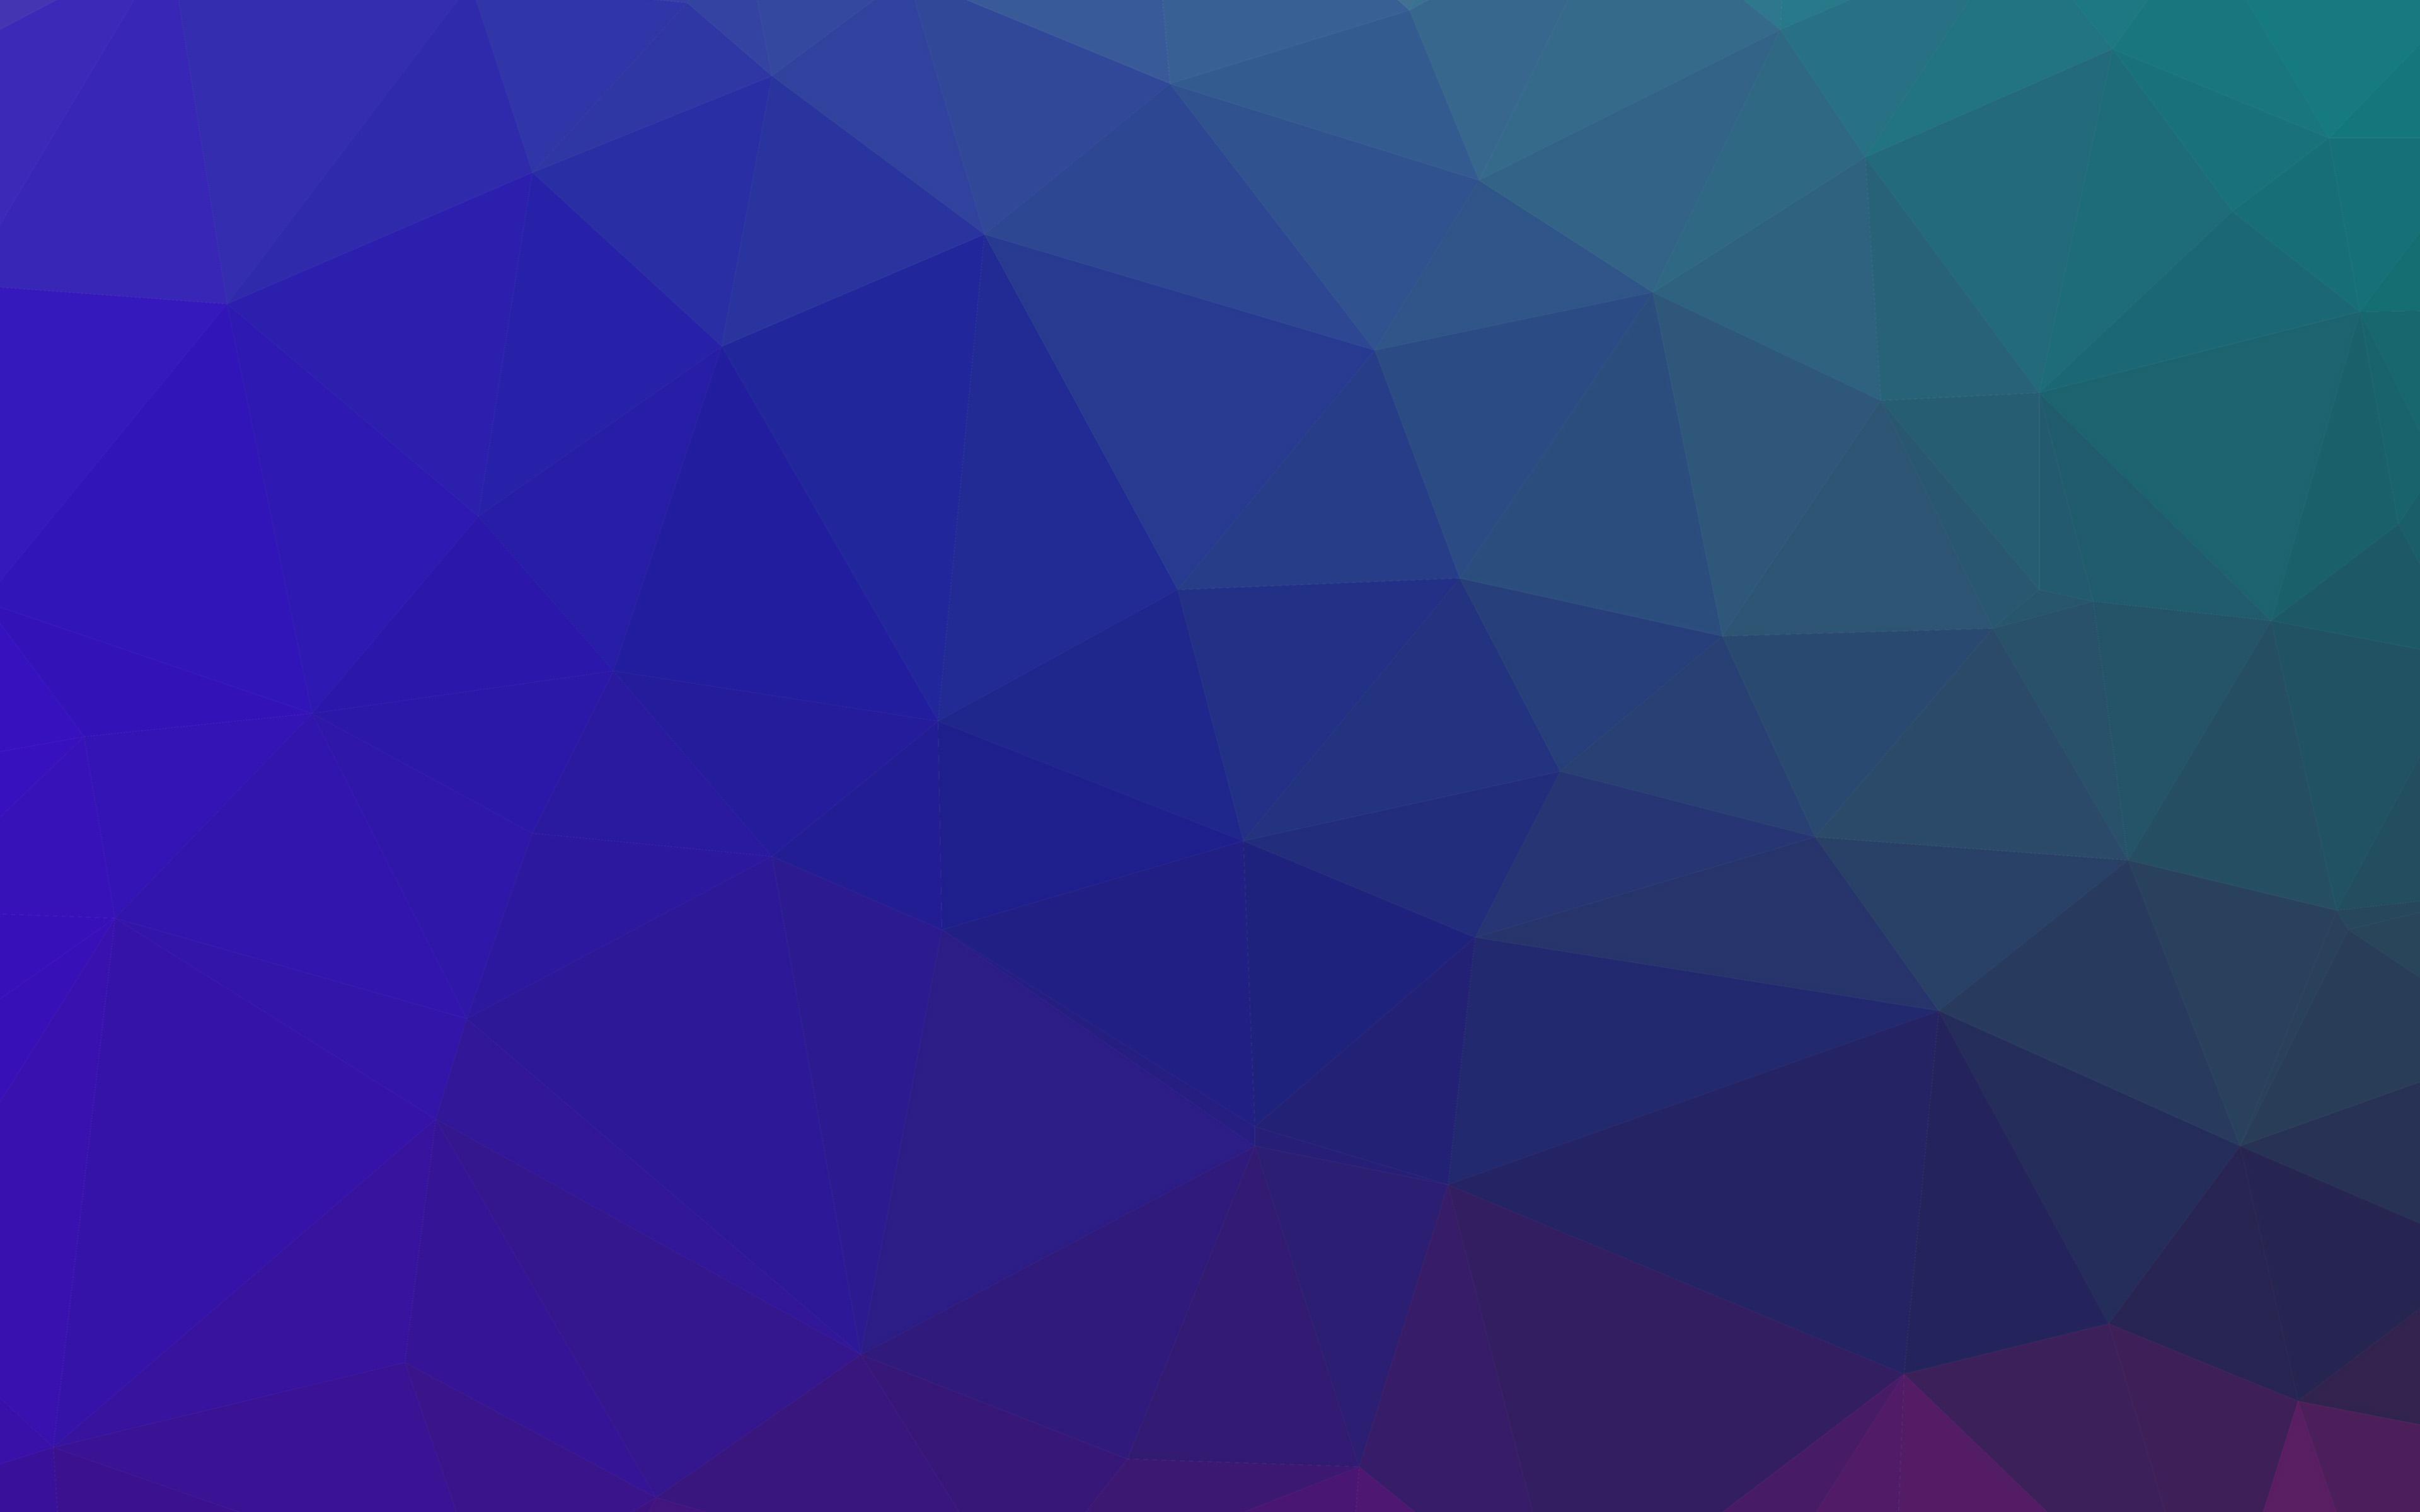 papers.co vk62 samsung galaxy polyart dark blue purple pattern 36 3840x2400 4k wallpaper